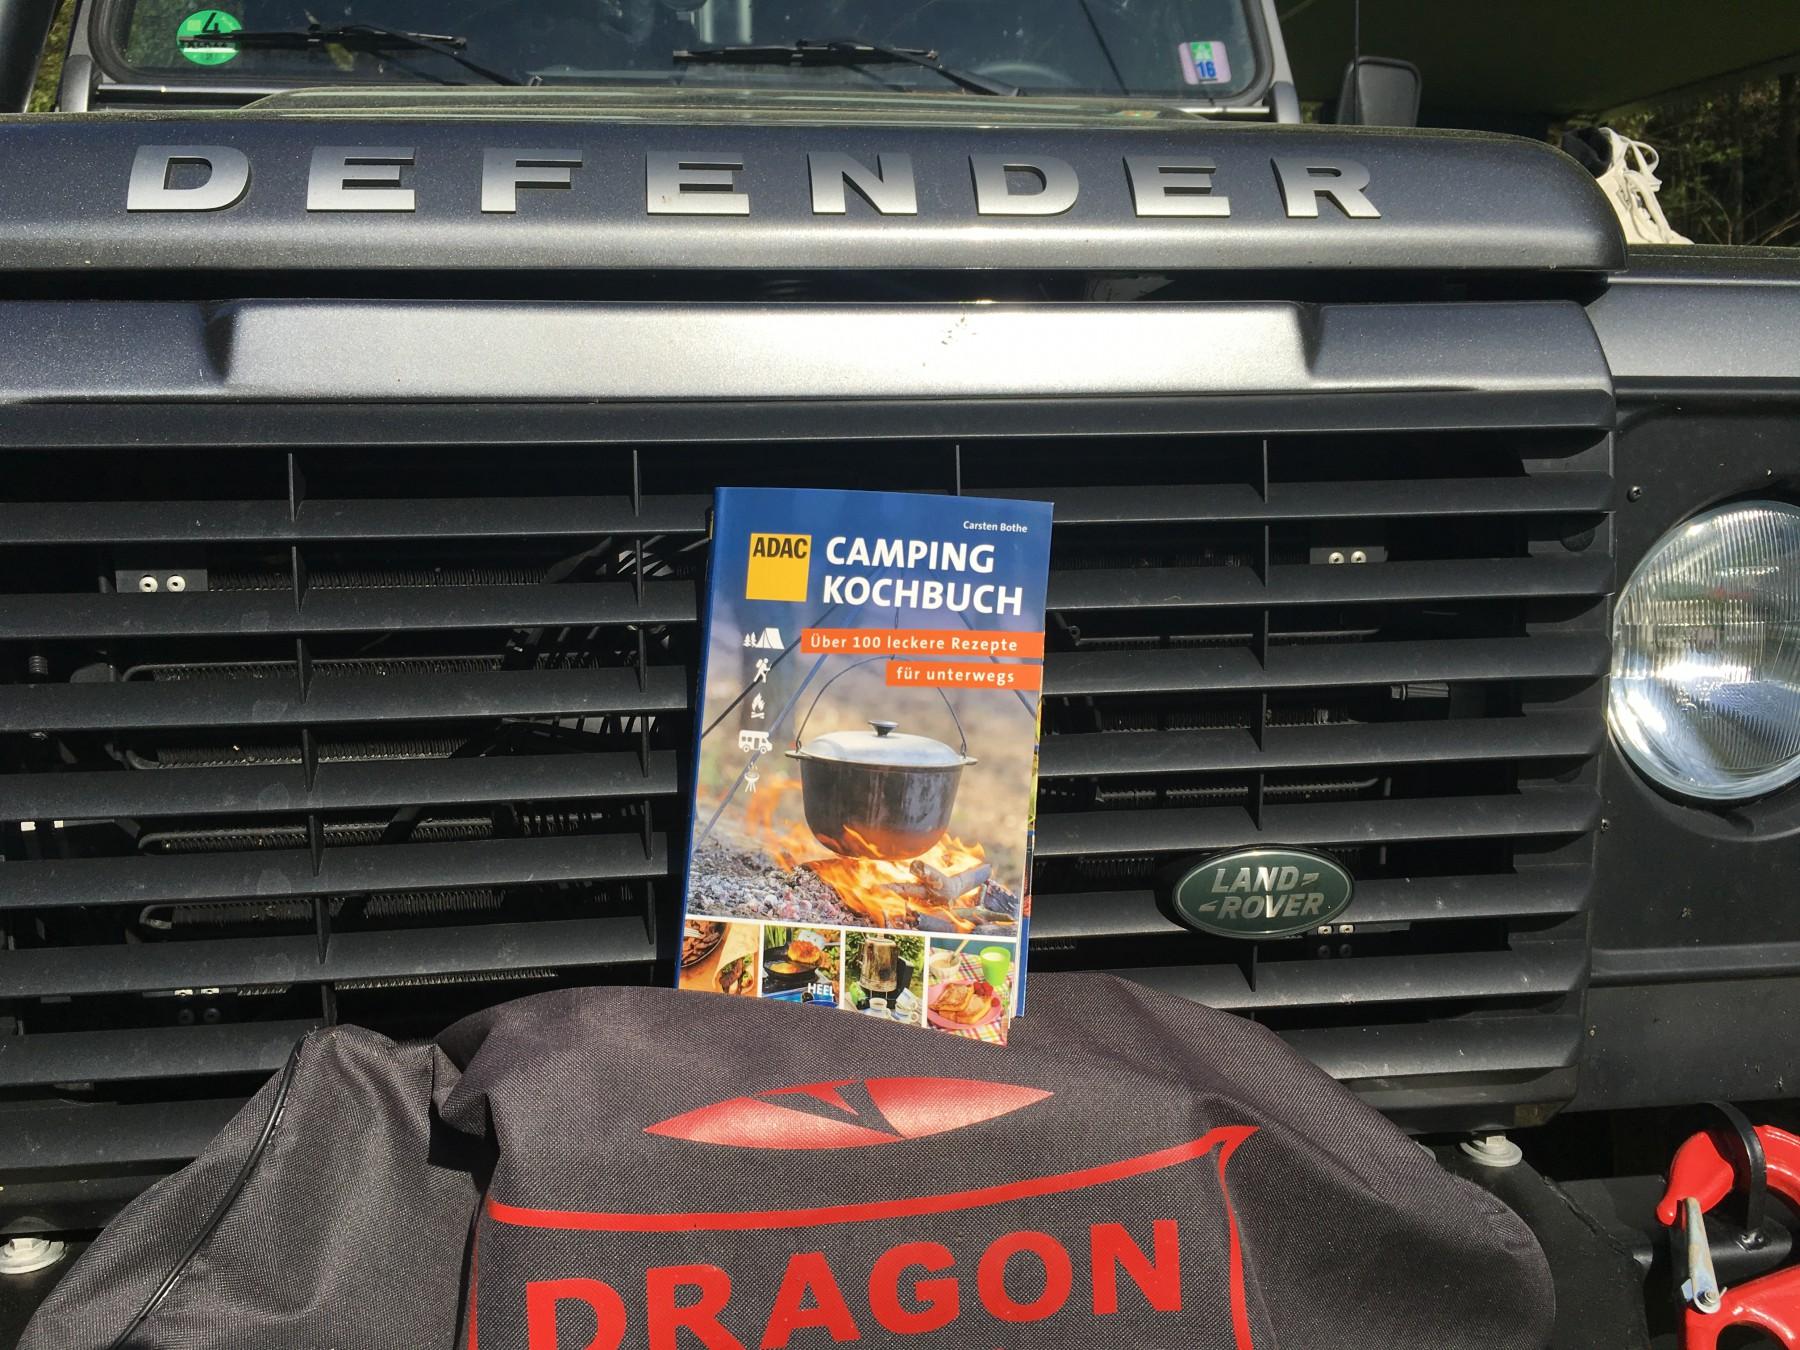 Camping-Kochbuch vom ADAC